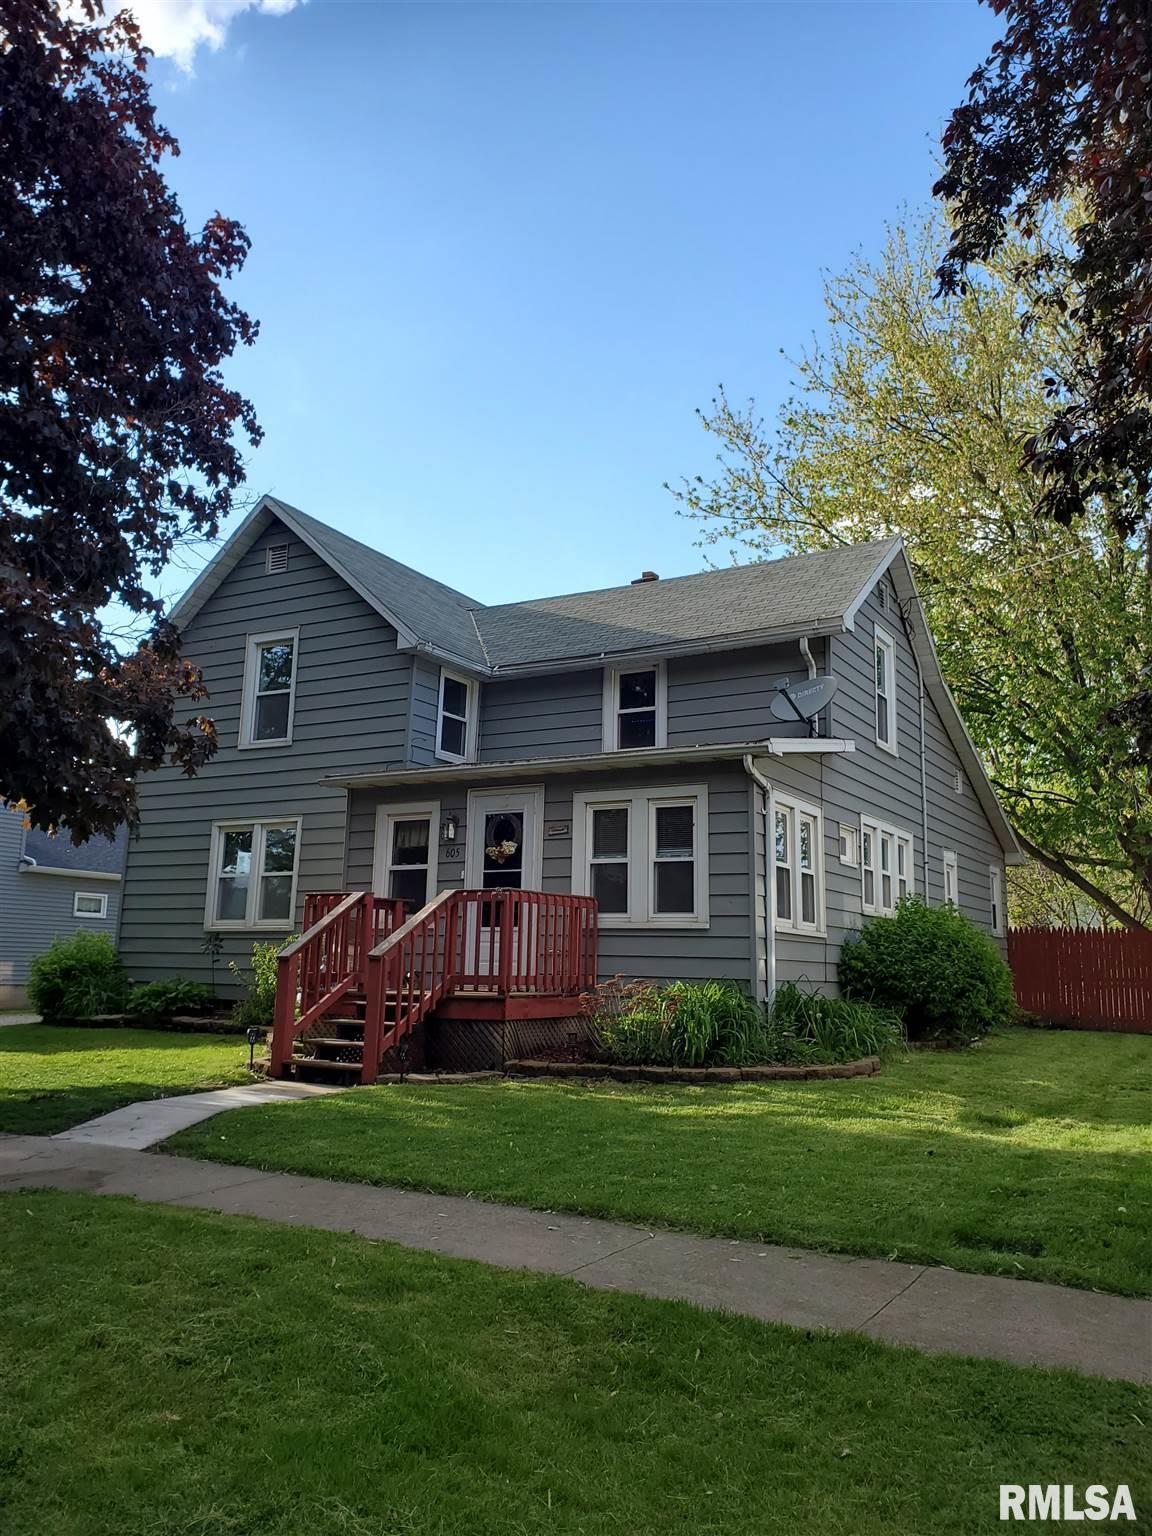 605 W MOUND Property Photo - Elmwood, IL real estate listing